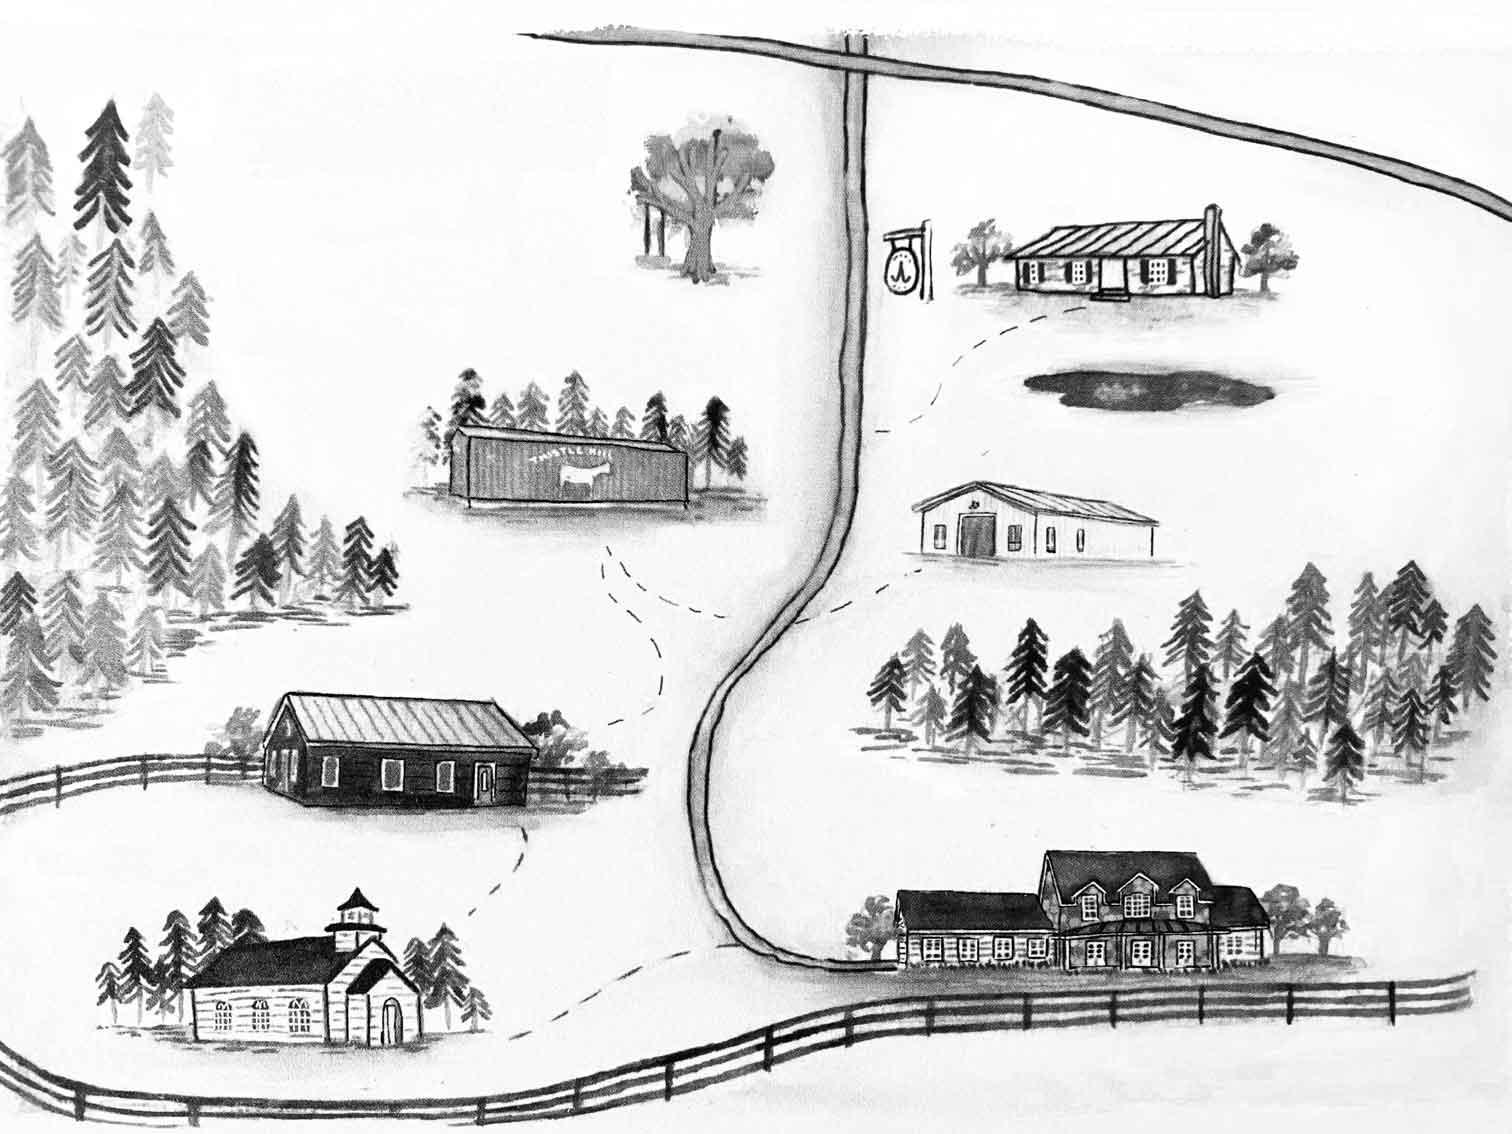 Thistle Hill Estate